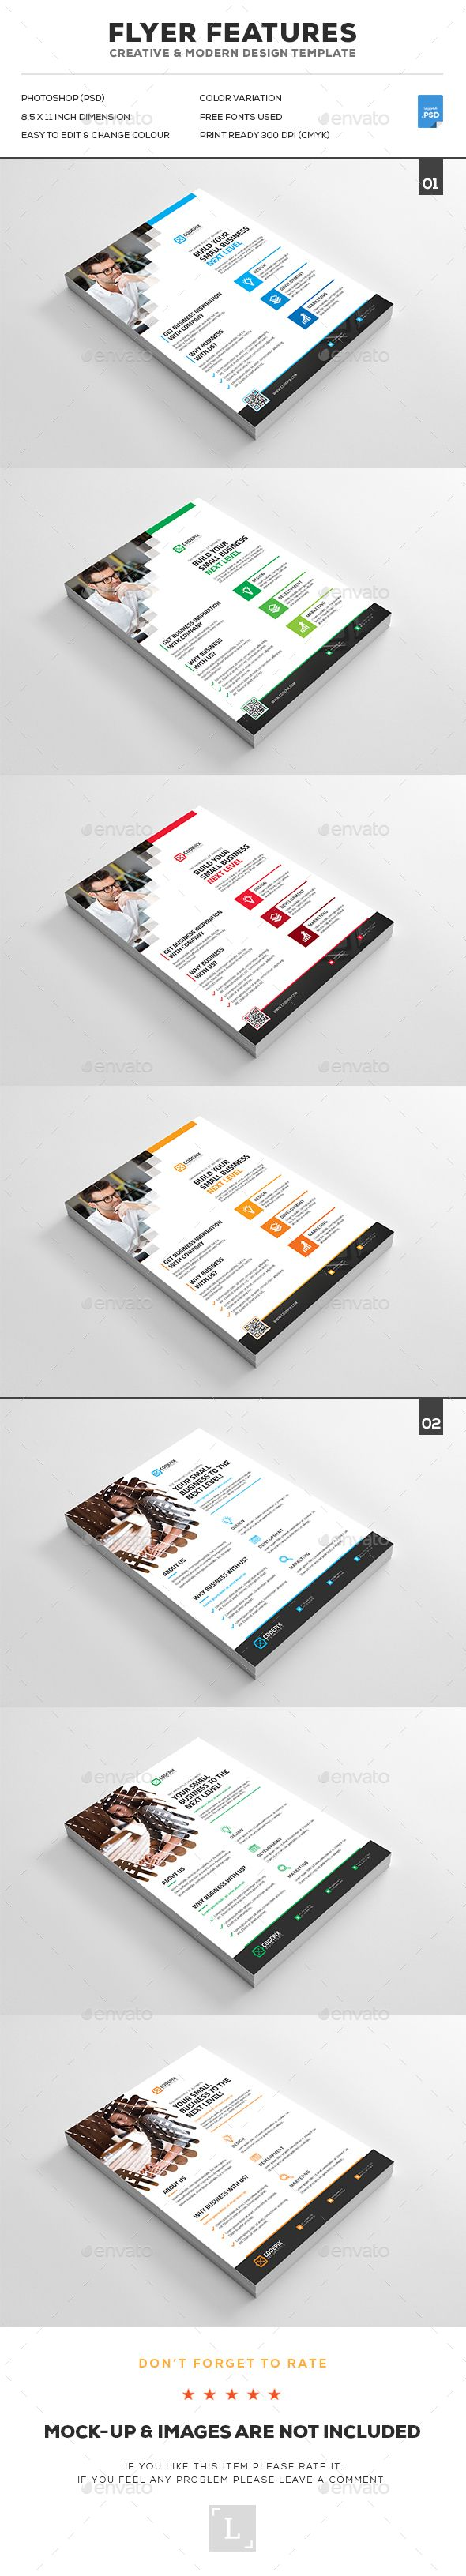 Flyer Template PSD Bundle. Download here: http://graphicriver.net/item/flyer-bundle/16666388?ref=ksioks